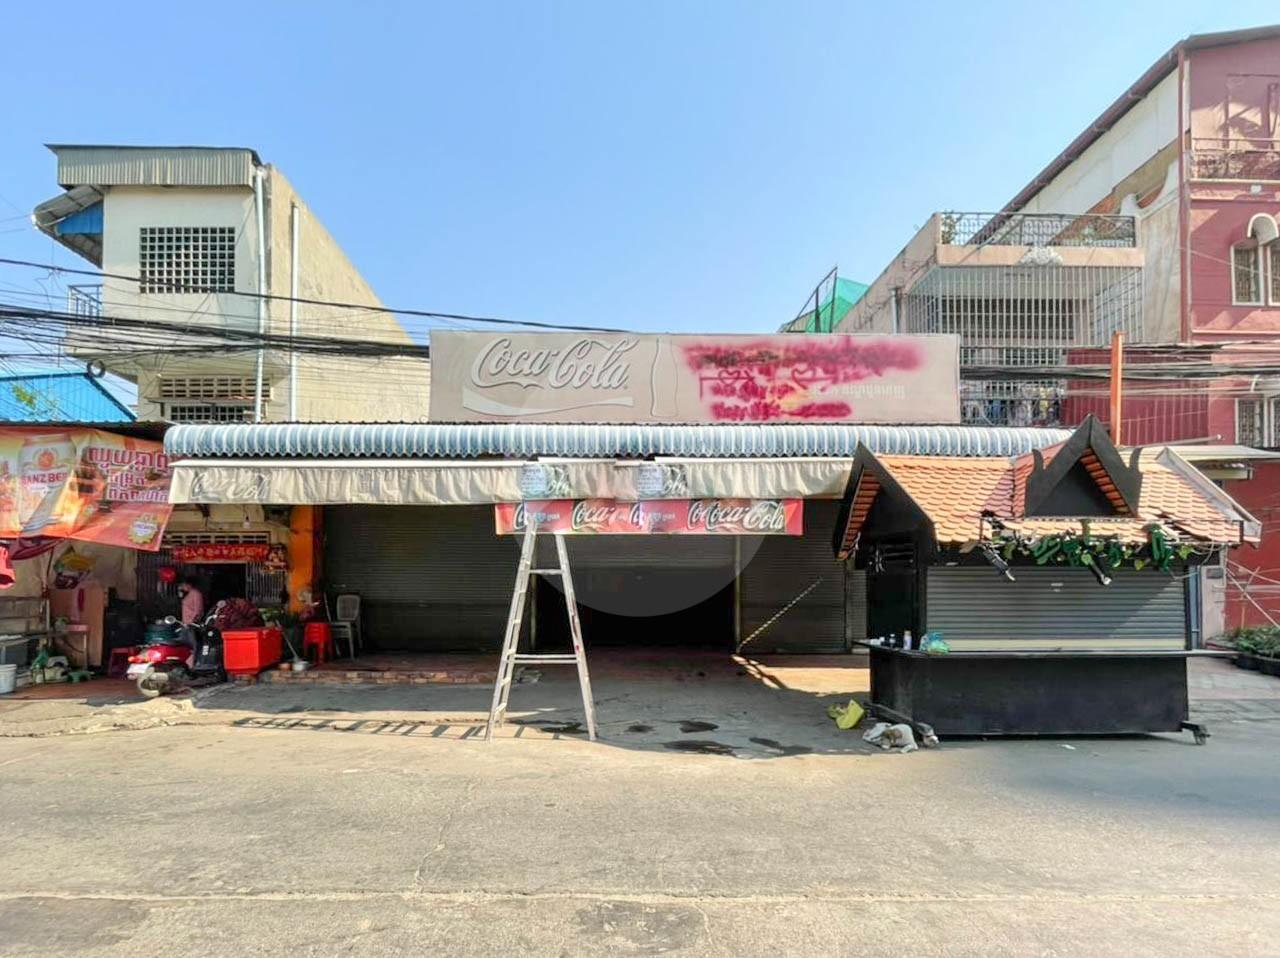 284 Sqm Commercial  Land For Rent - Wat Phnom, Phnom Penh